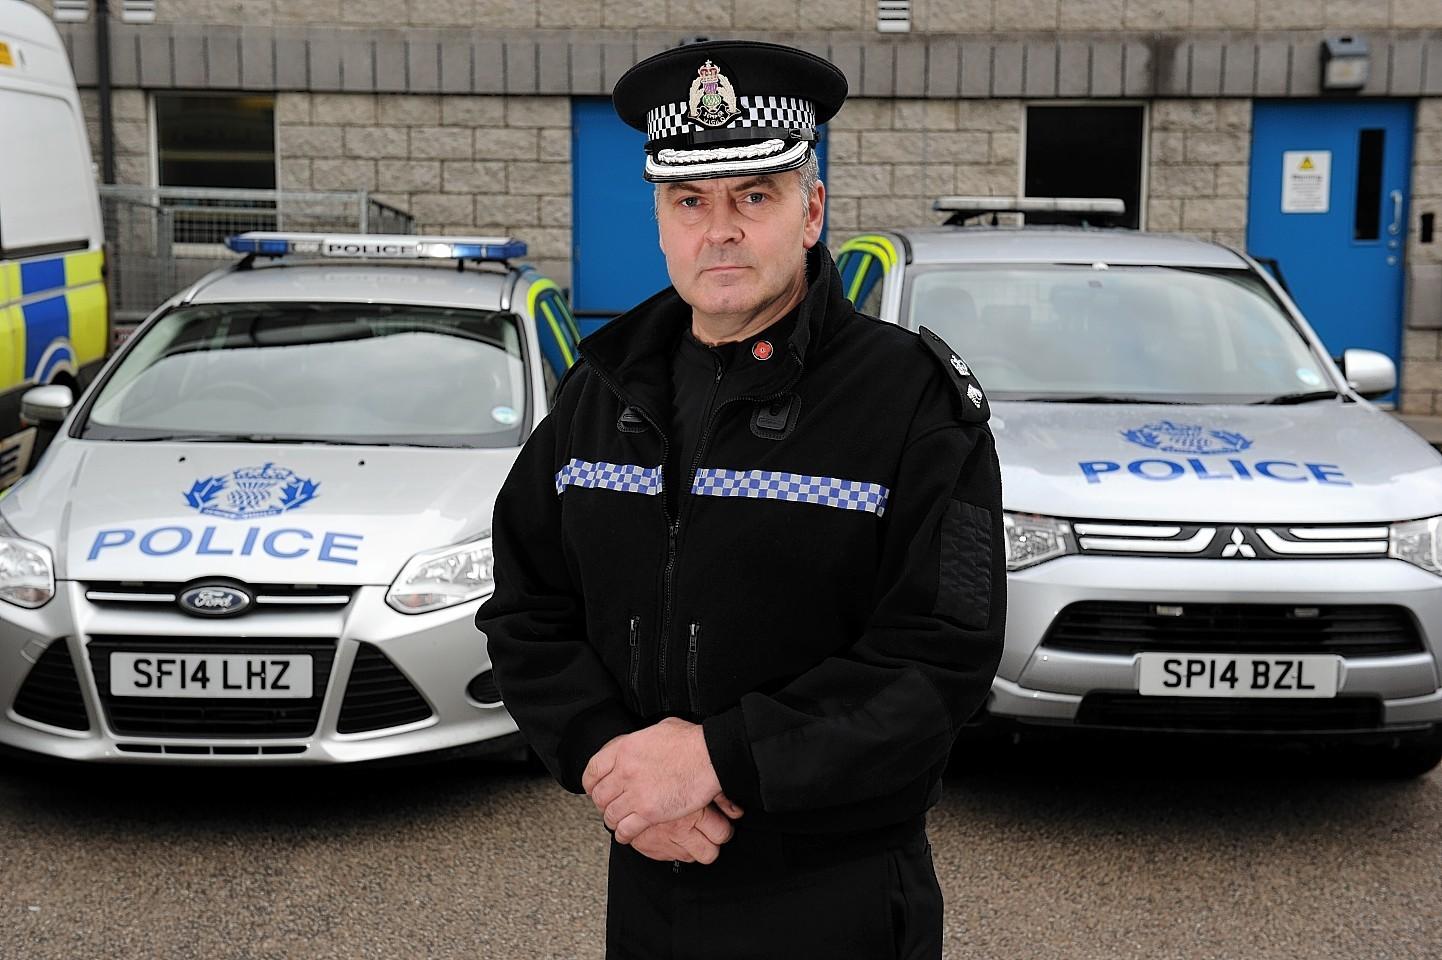 Chief Superintendent Mark McLaren